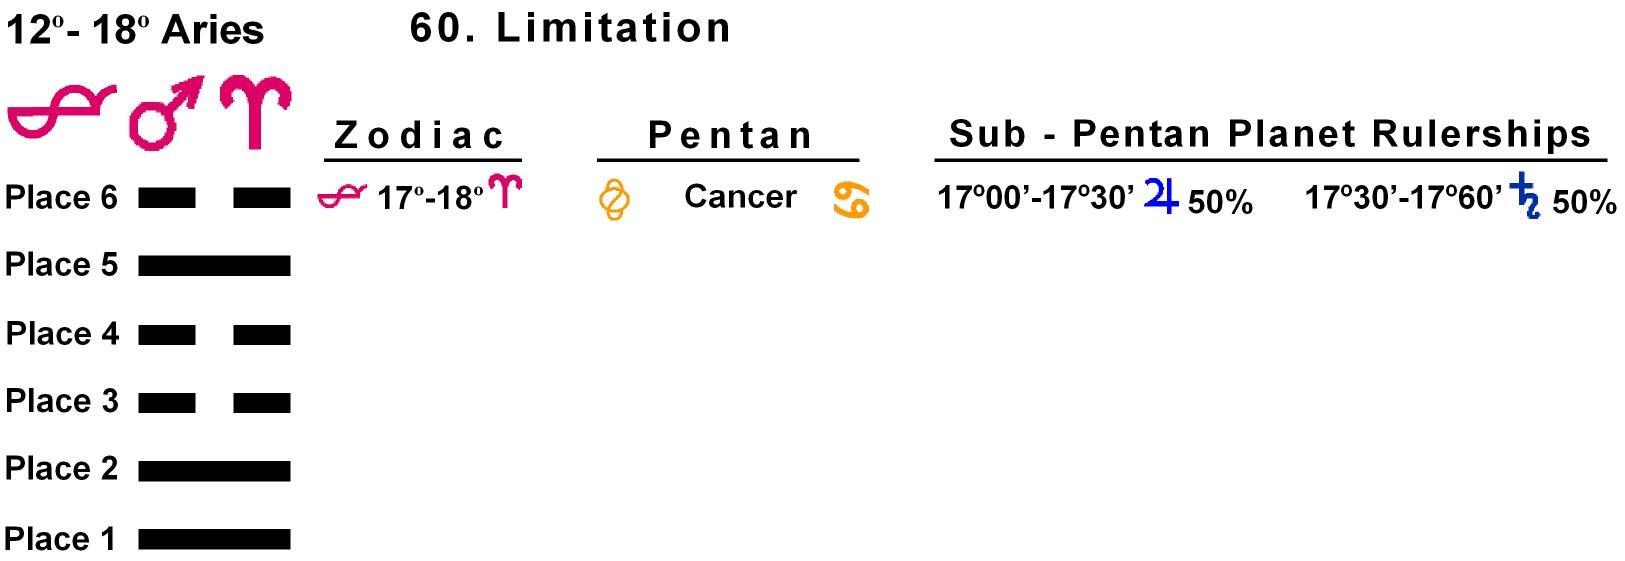 Pent-lines-01AR 17-18 Hx-60 Limitation